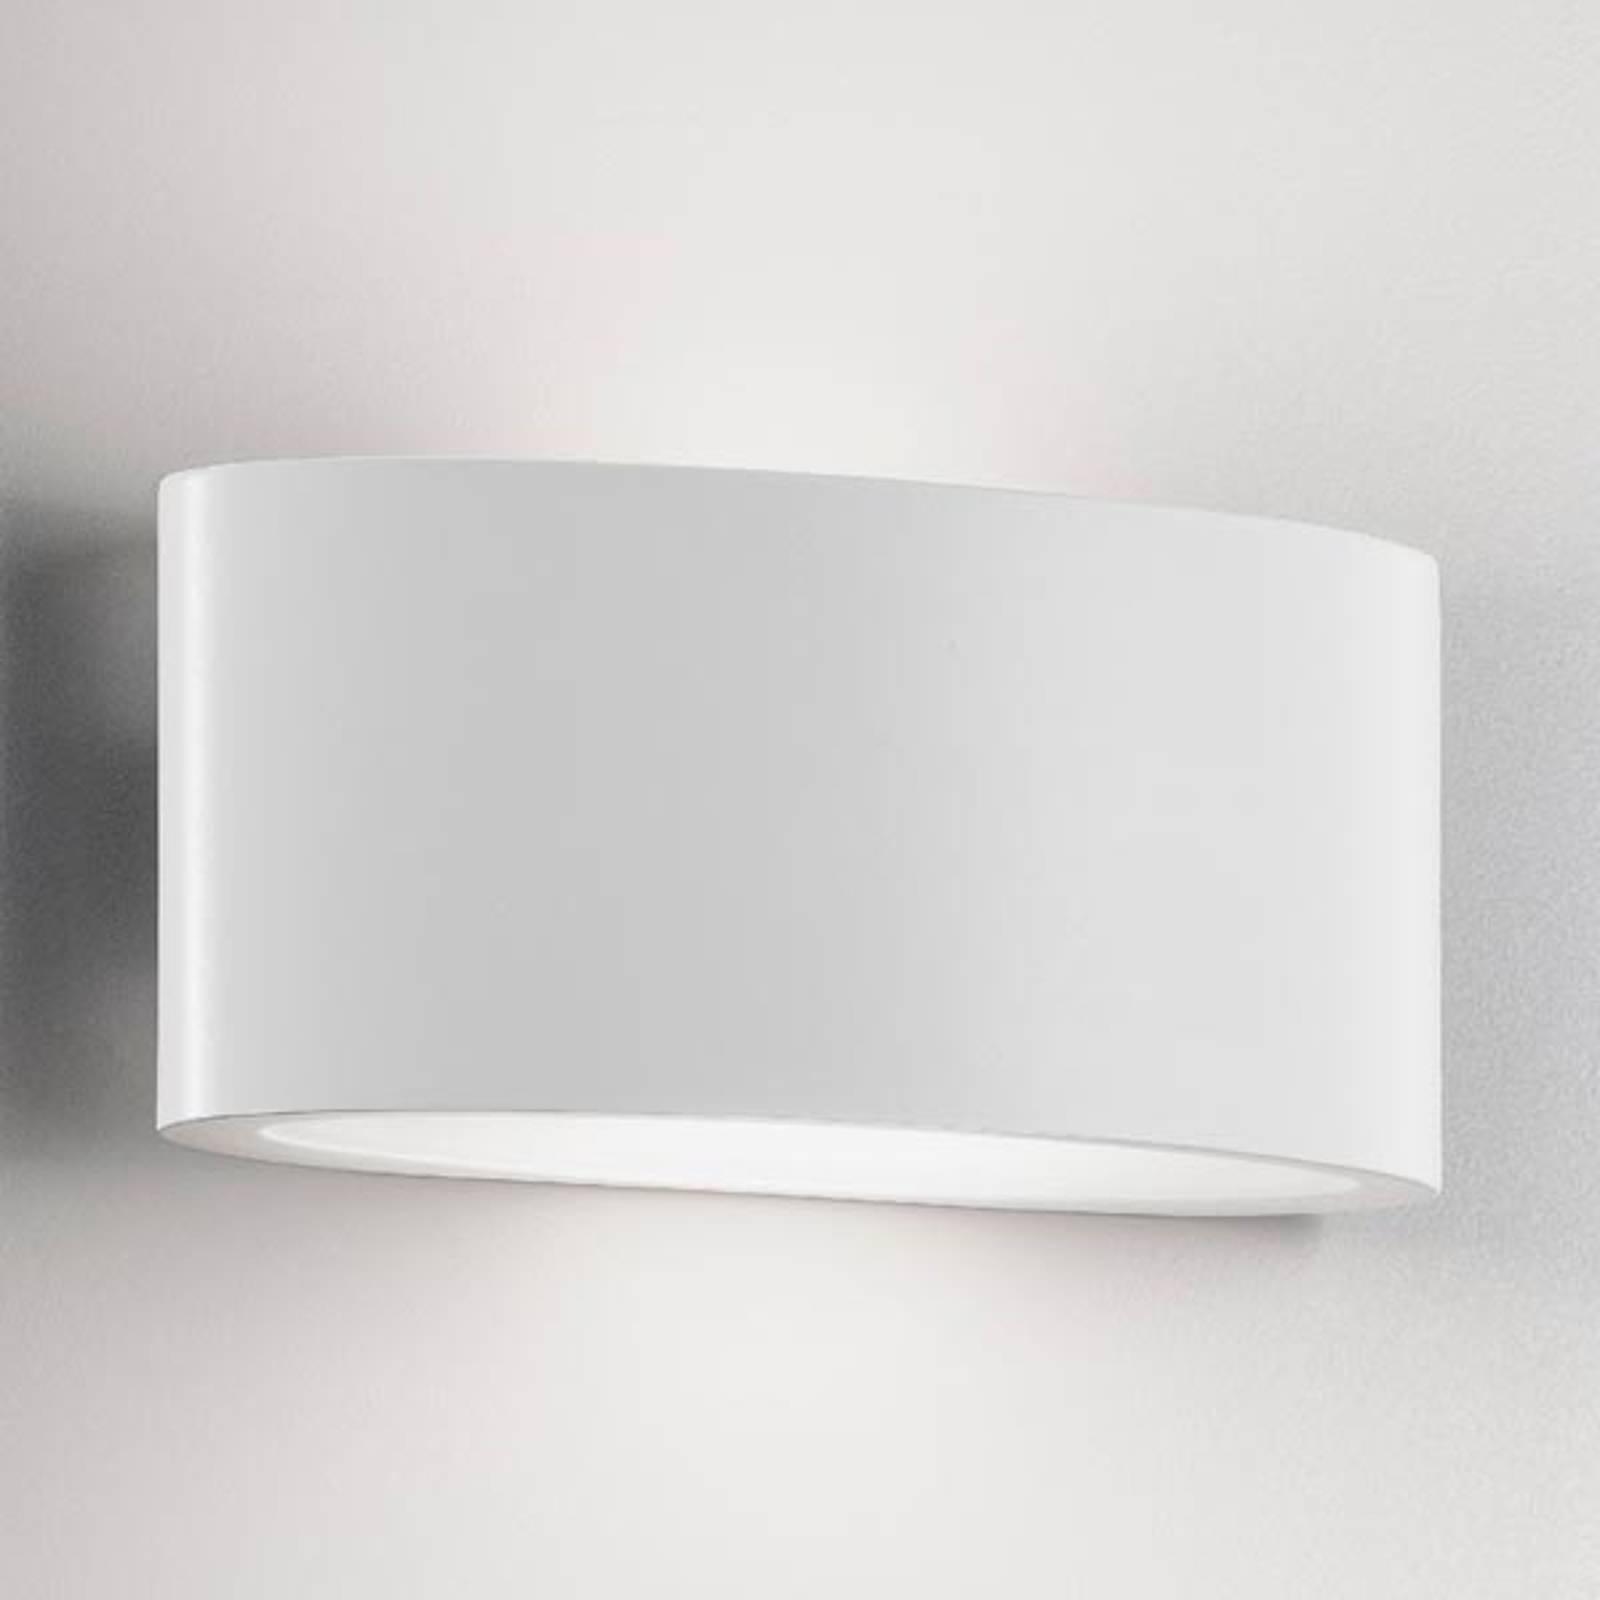 LED buitenwandlamp Ovalino in wit